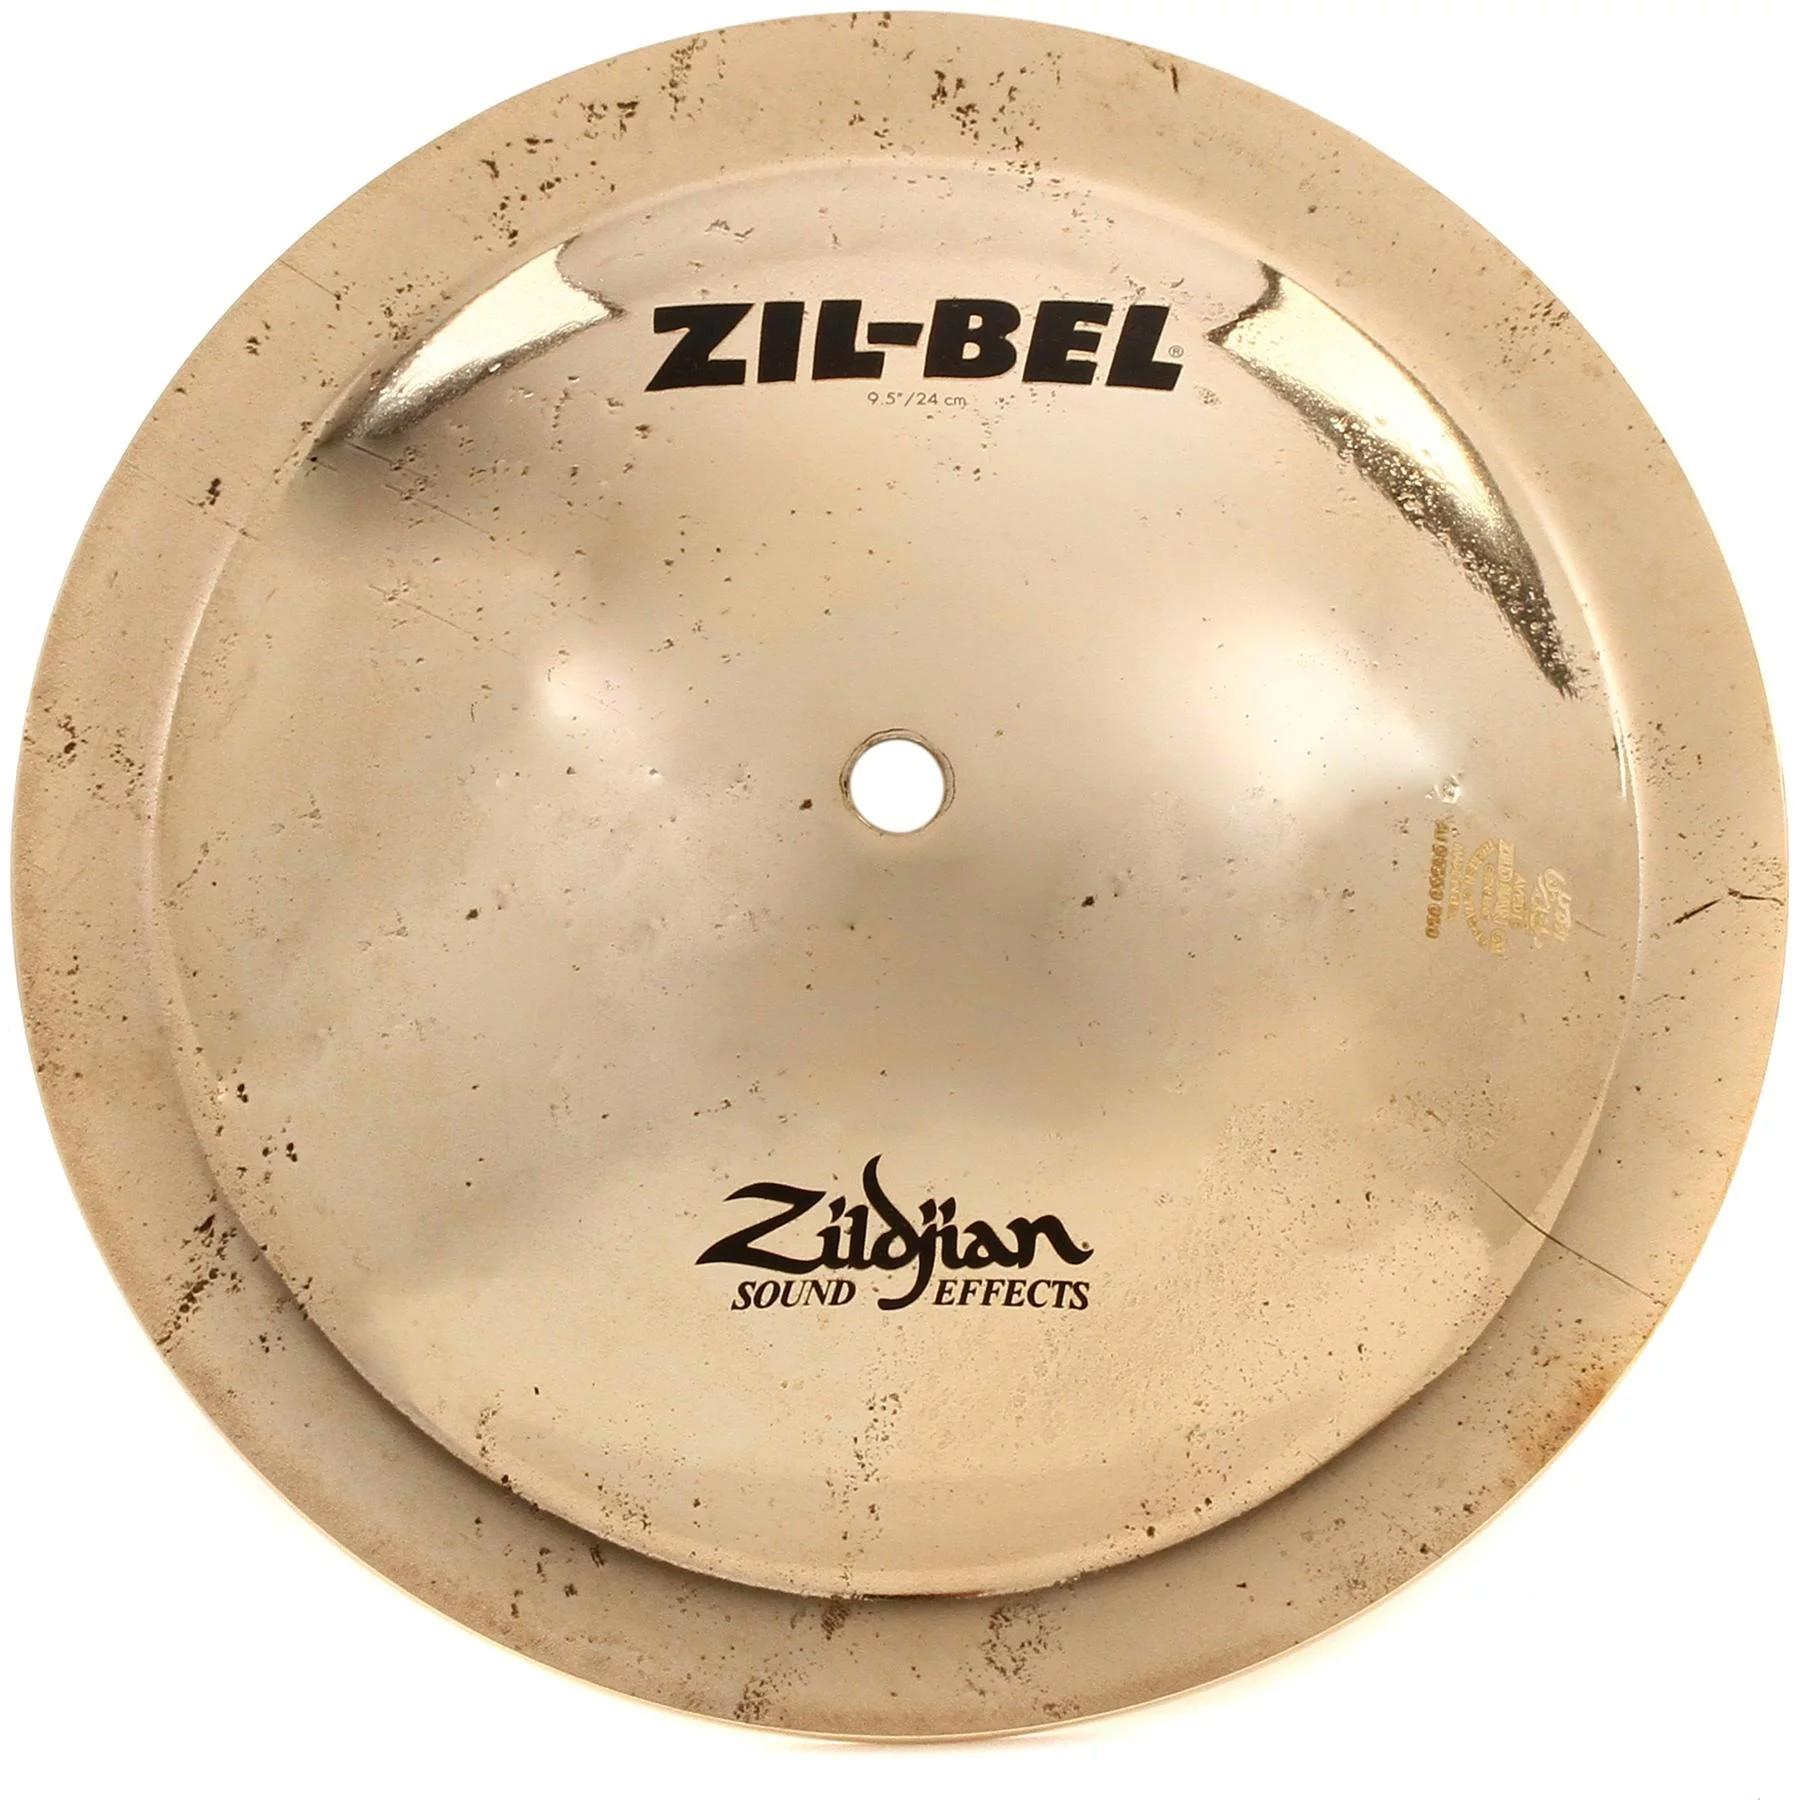 Zildjian A20002 LARGE ZIL BEL Clash Cymbal